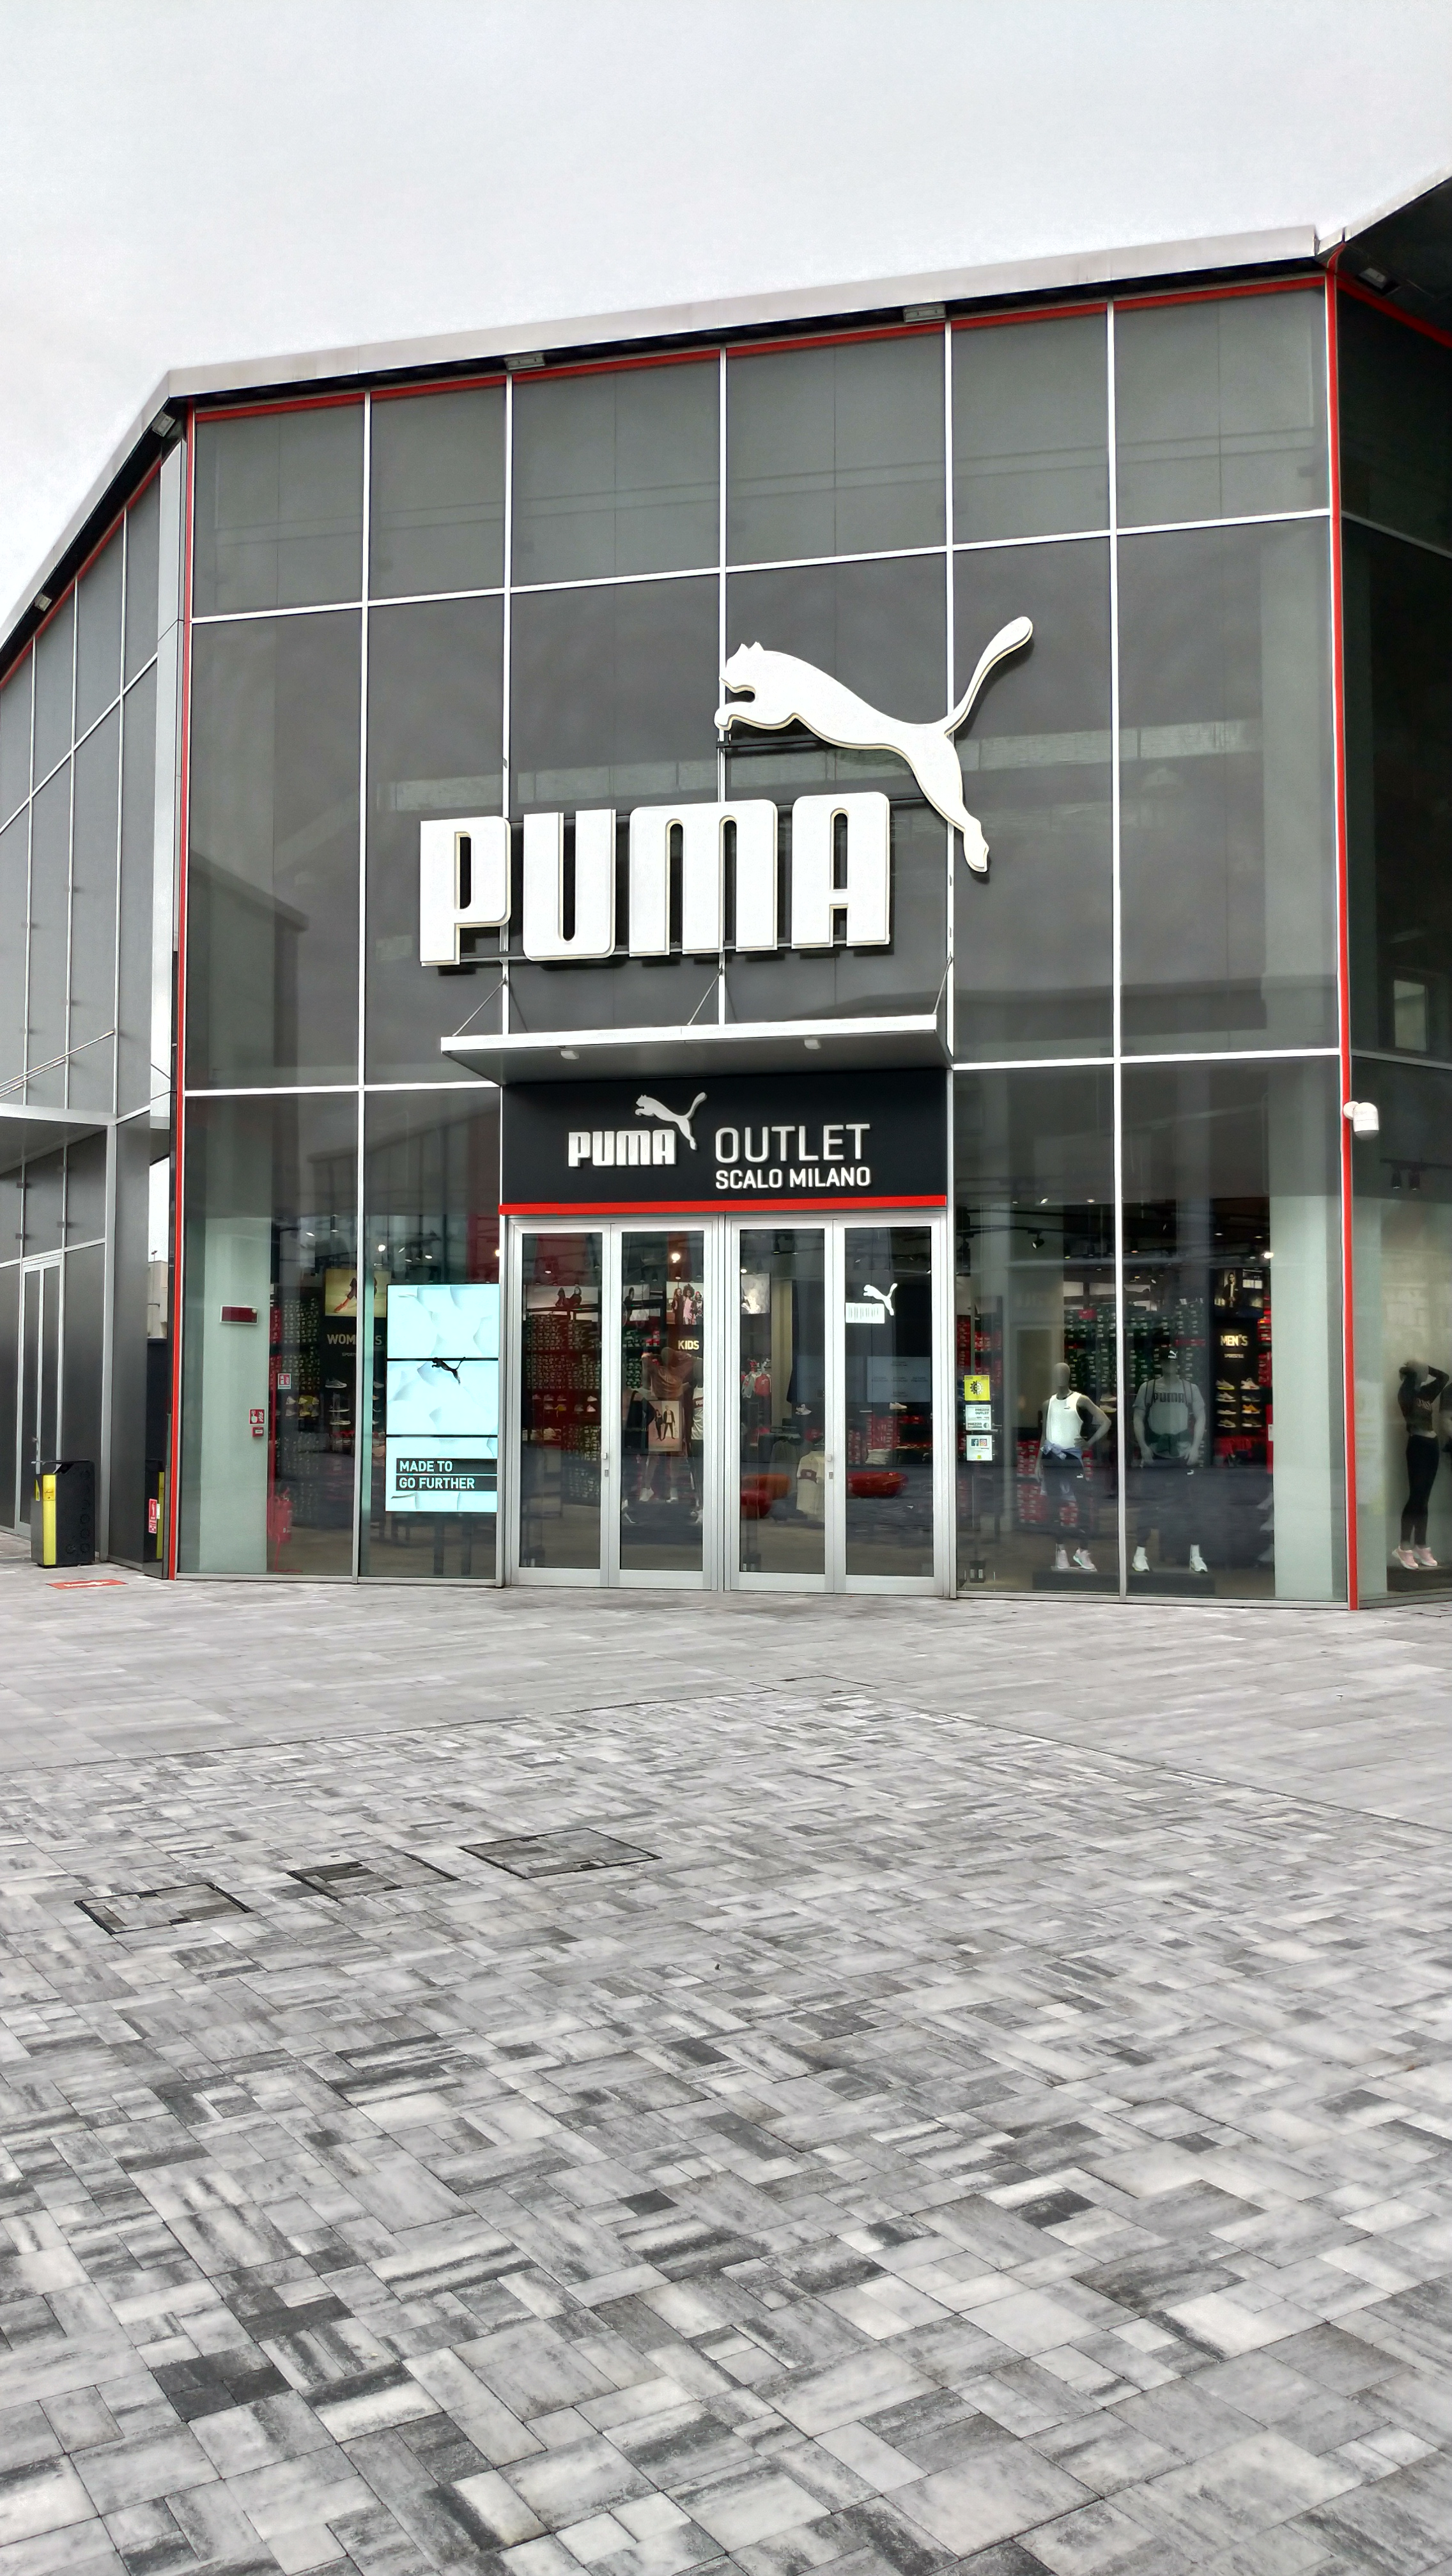 Puma Outlet Scalo Milano a Milano (MI)   Pagine Gialle